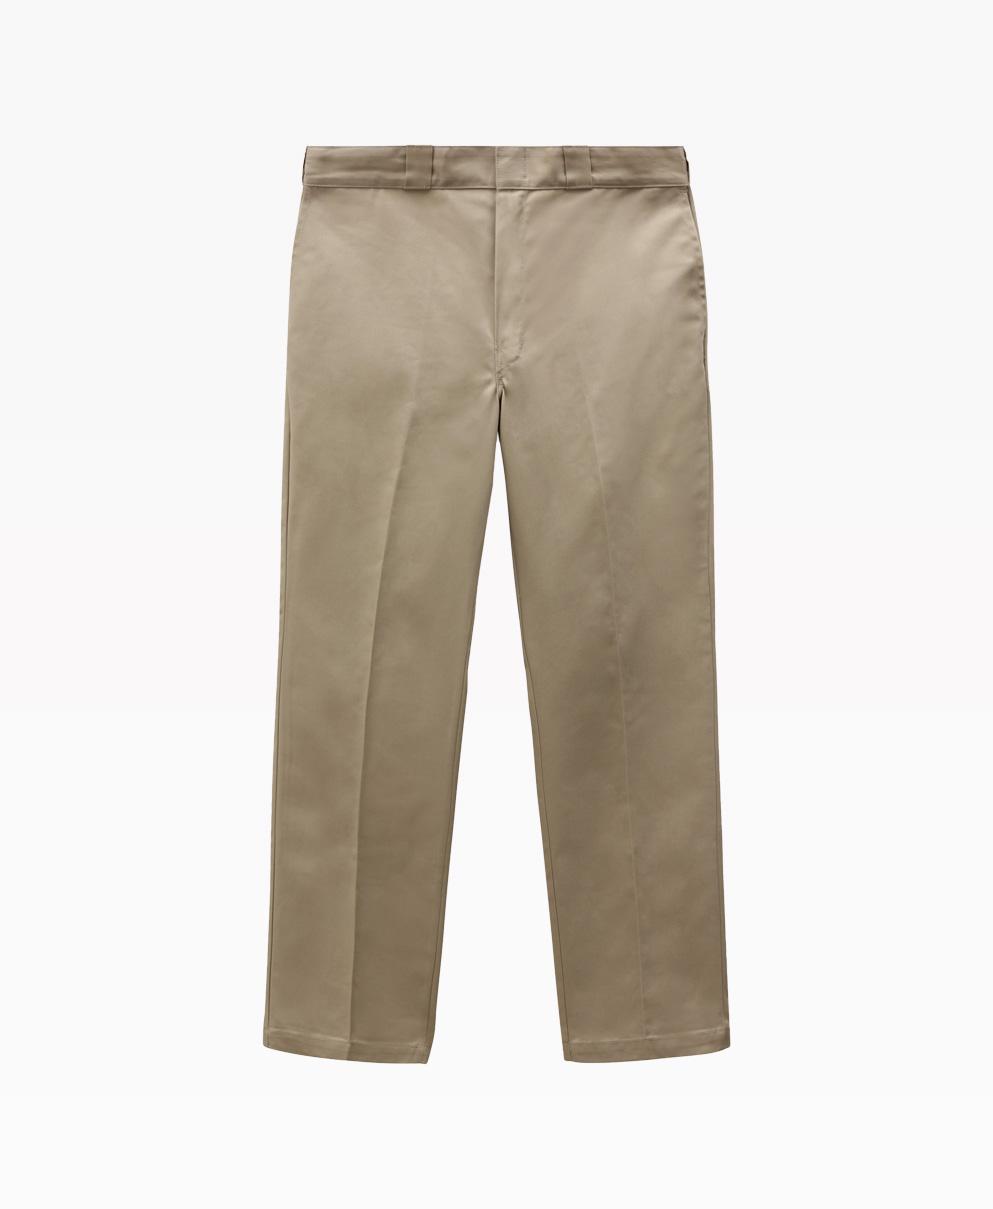 Dickies 874 Pants Khaki Front